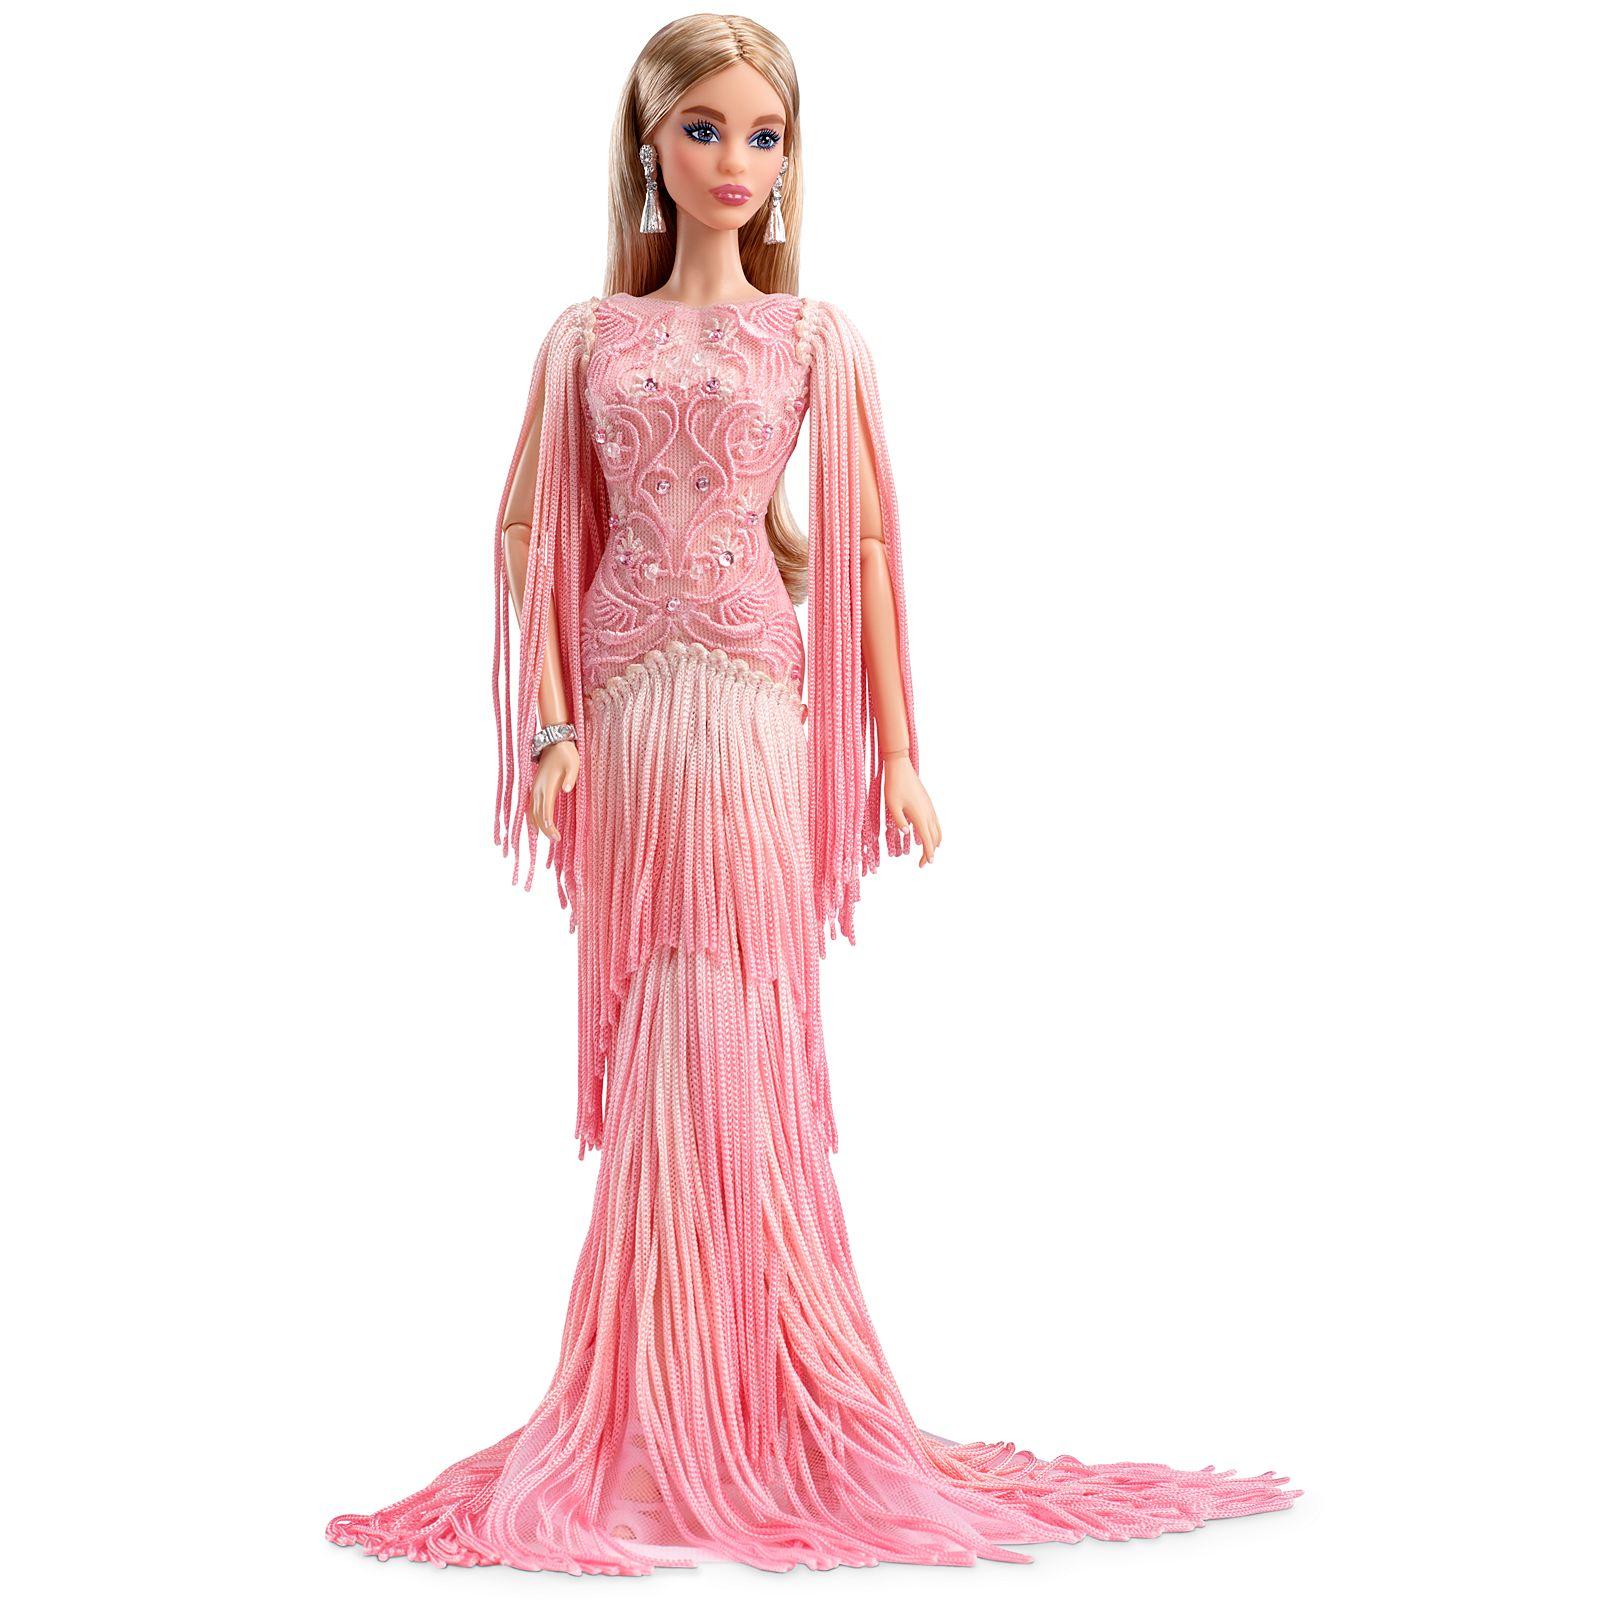 Blush Fringed Gown Barbie Doll